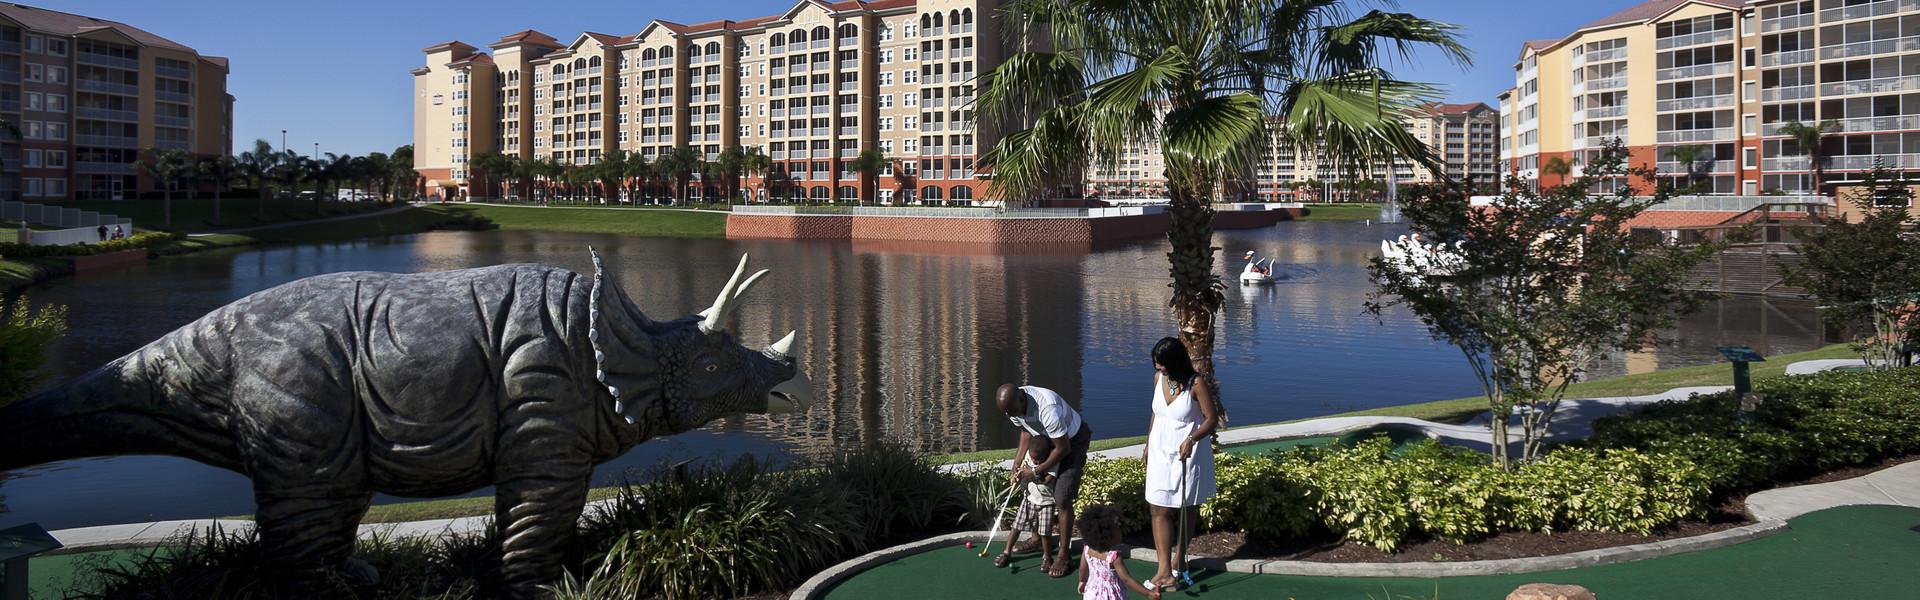 Mini golf in Orlando Florida at our resort   Westgate Lakes Resort & Spa